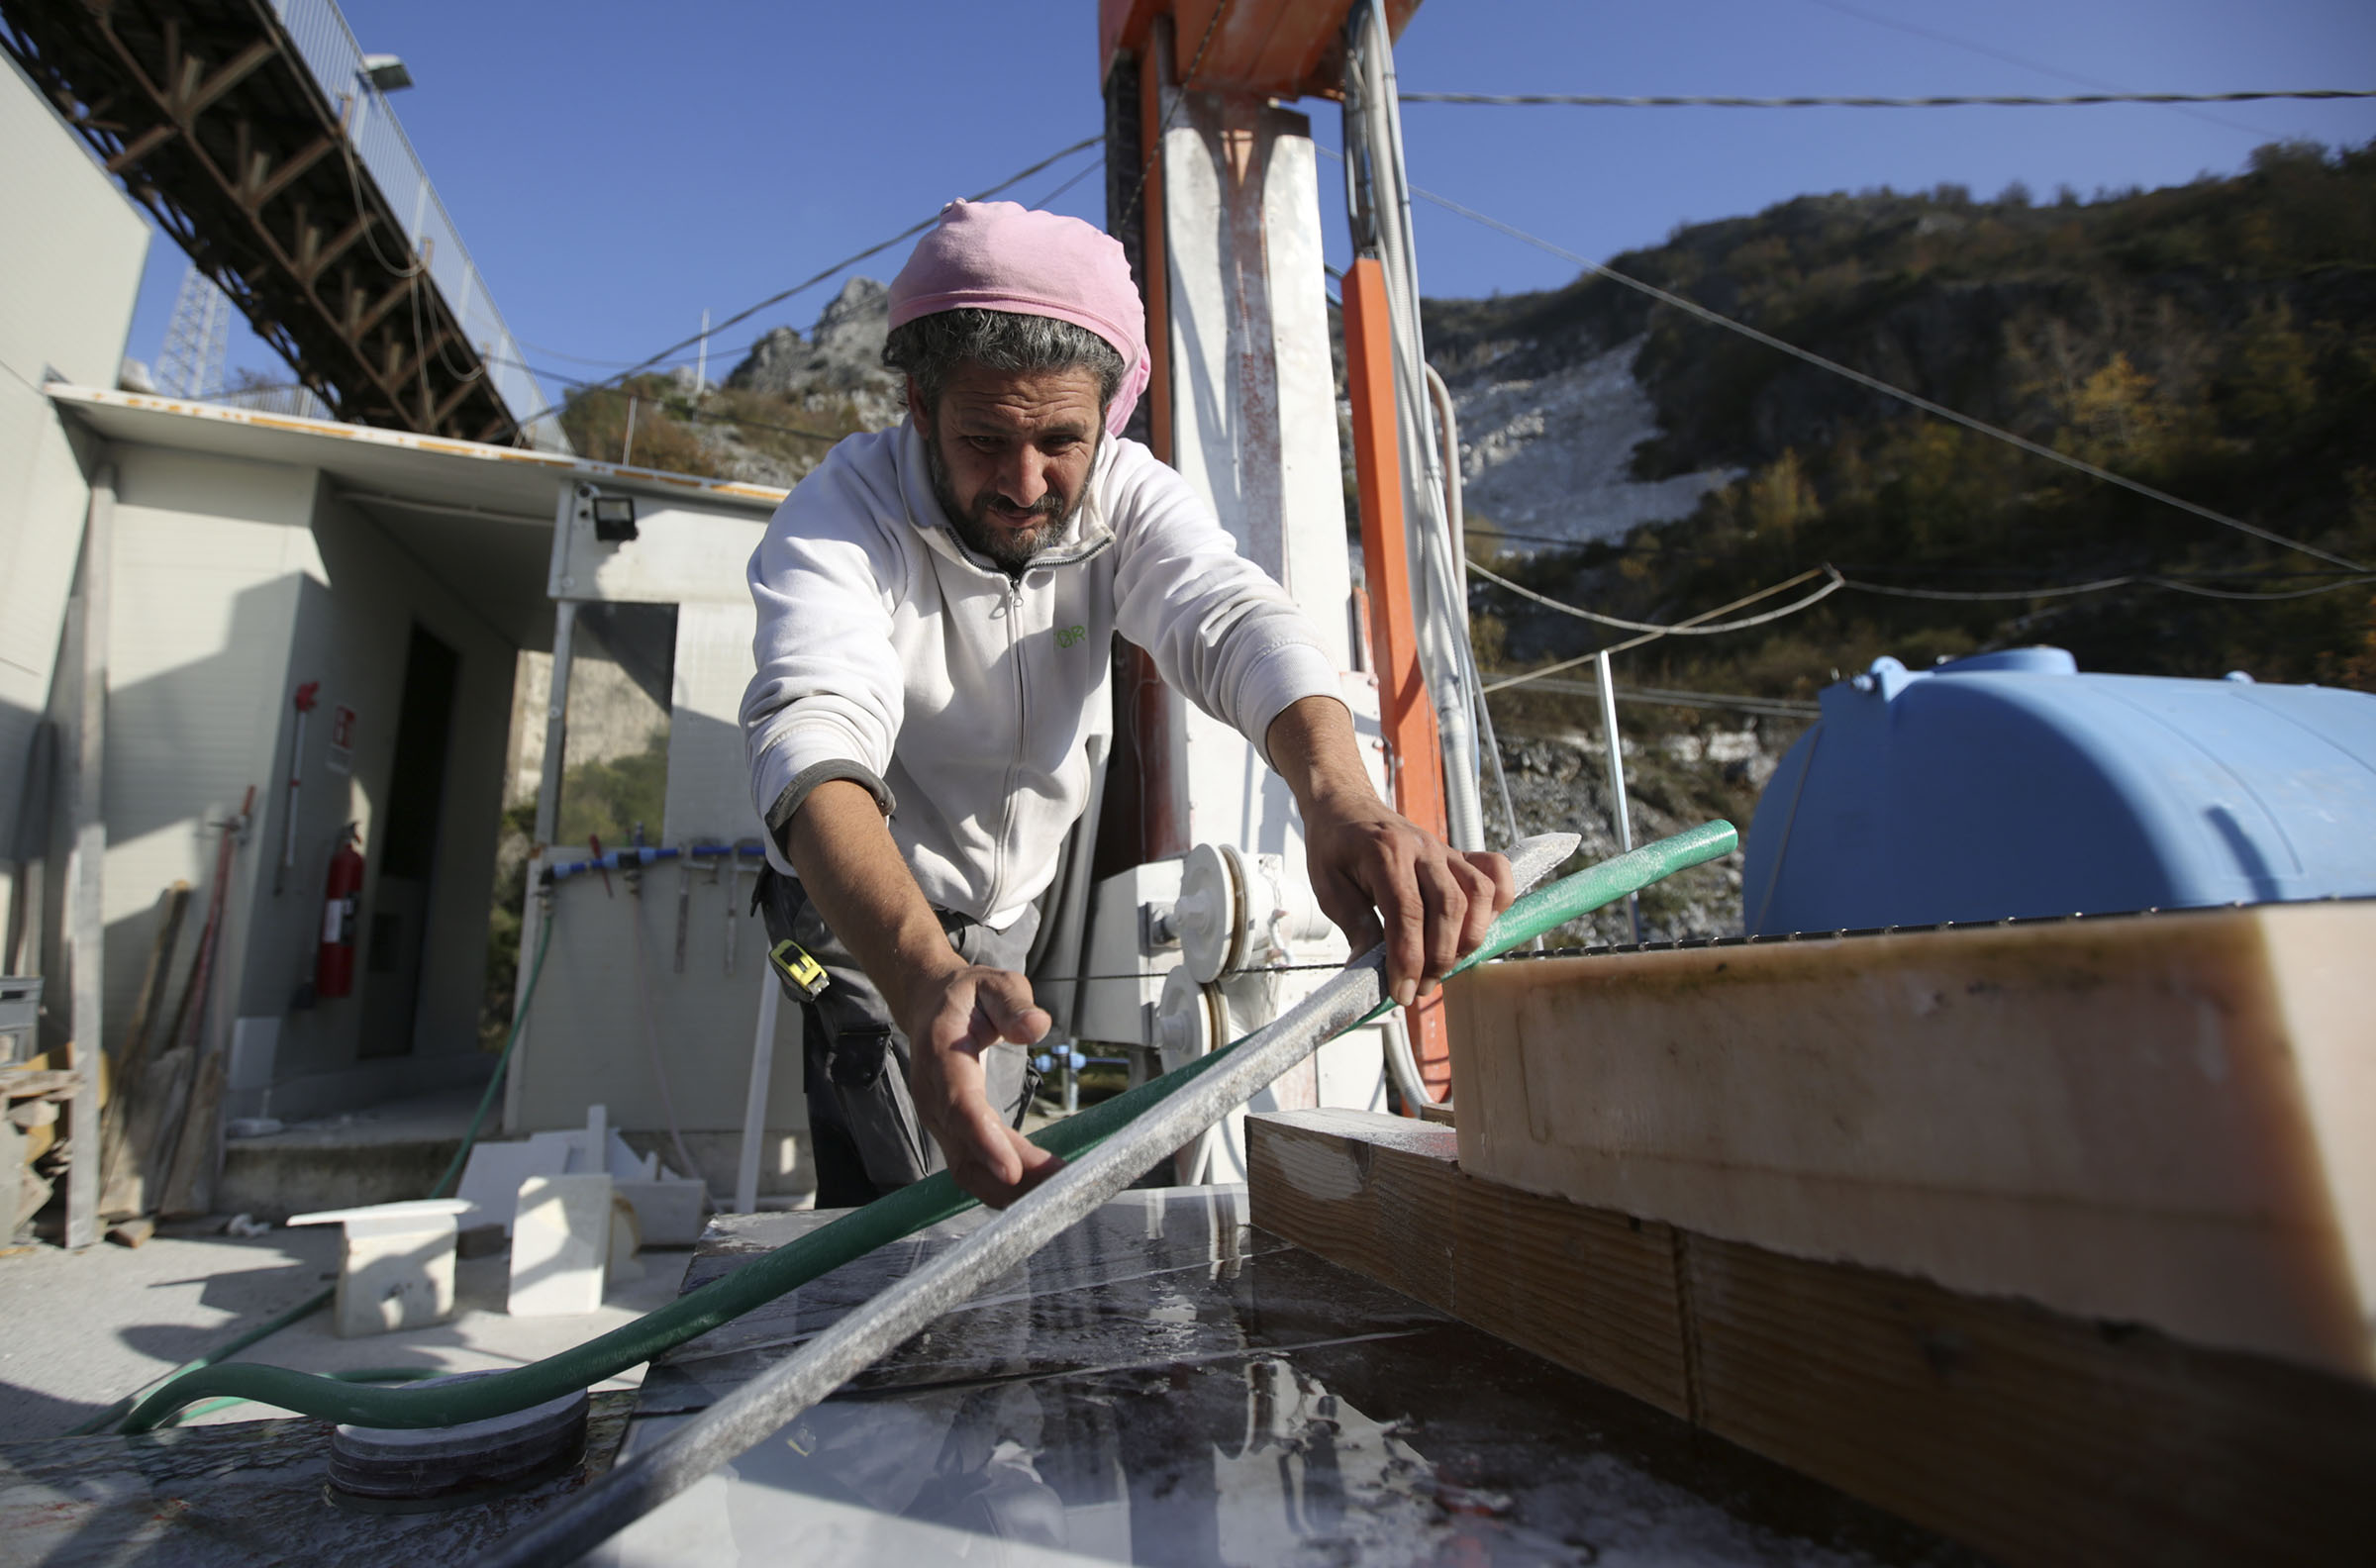 Simone Zanaglia measures where to cut Portuguese pink marble at TORART in Carrara, Italy, on Thursday, Nov. 15, 2018.